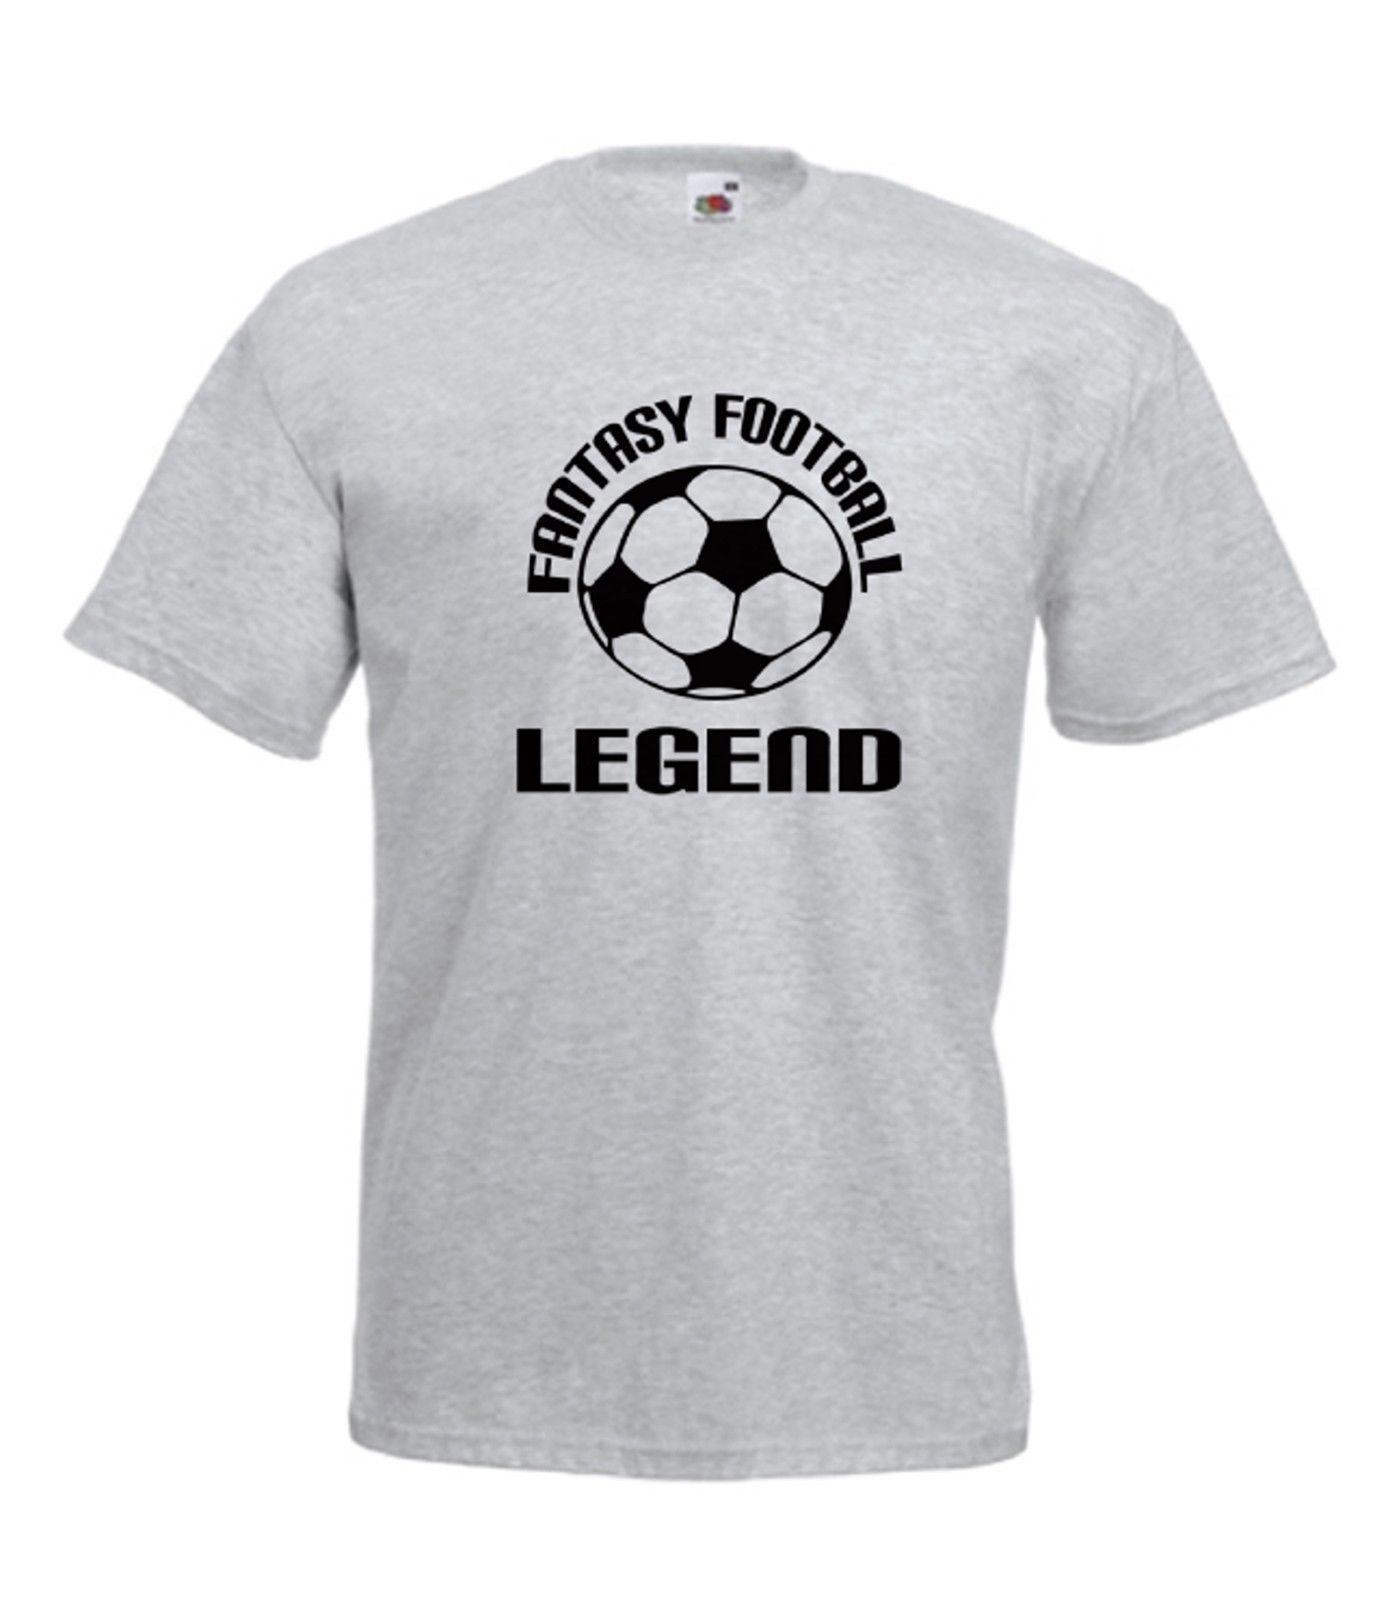 8d20d1671b5 FANTASY FOOTBALL Funny Sport Xmas Birthday Gift Idea Boys Girls Kids T SHIRT  TOP Short Sleeve Plus Size T Shirt Crazy T Shirt Sayings Tee Shirt Shop  Online ...